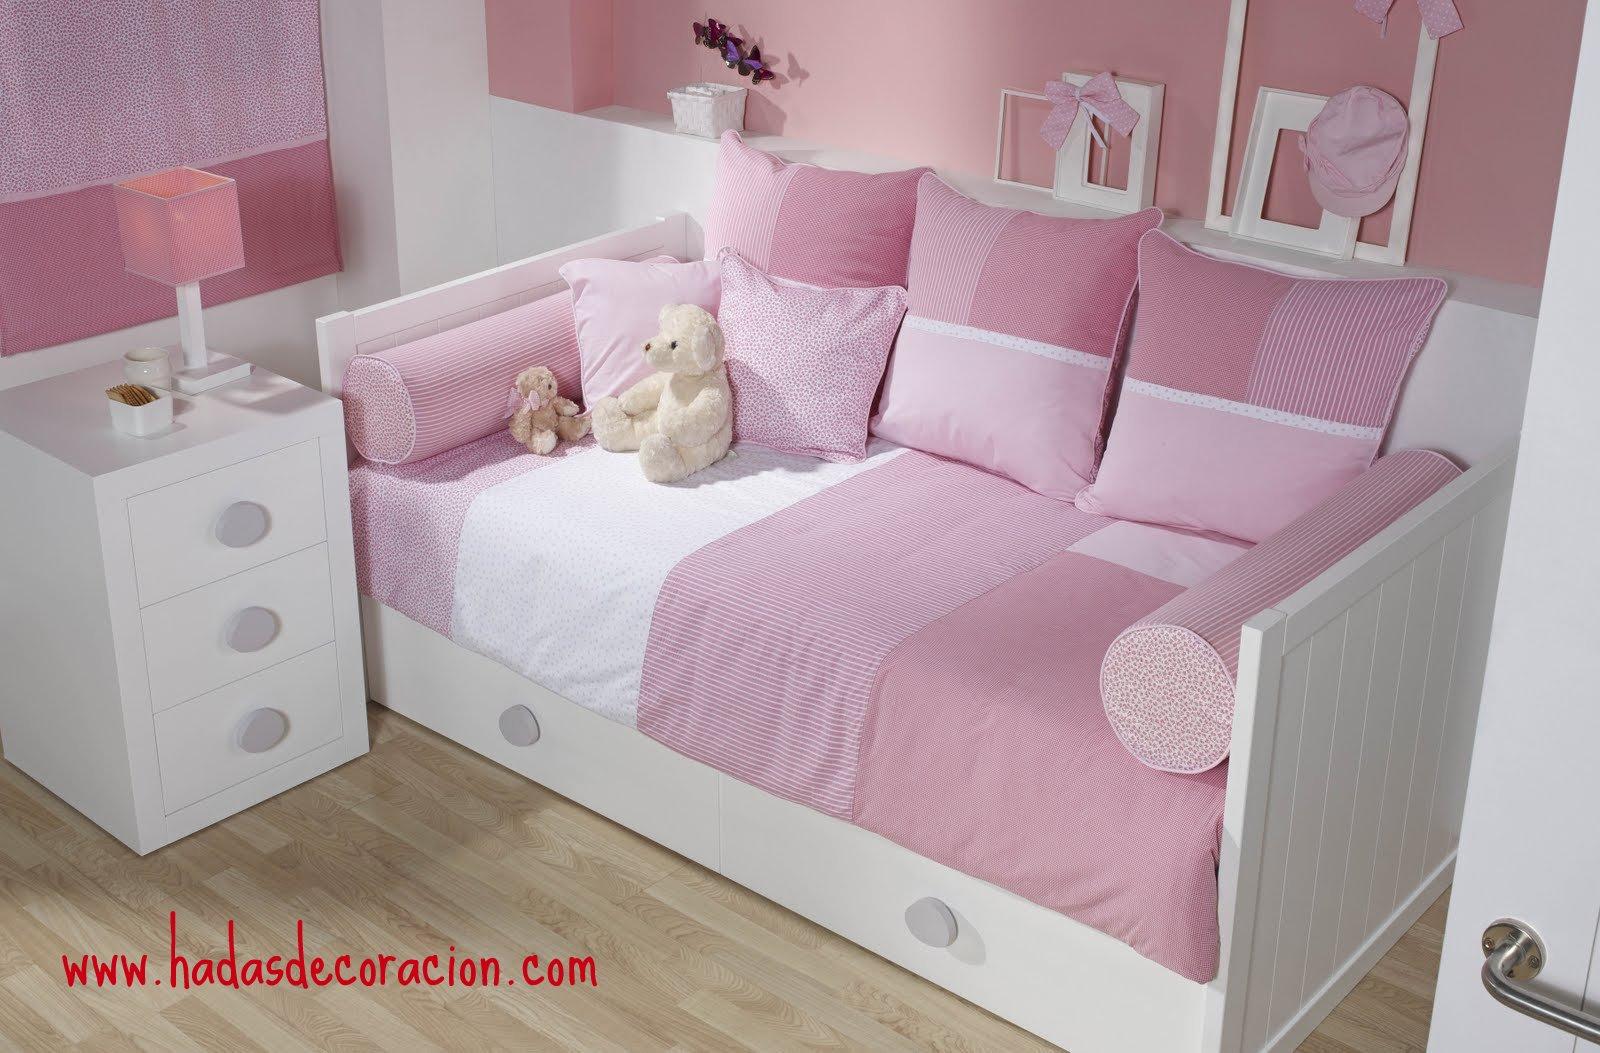 Hadas moda y decoracion infantil coleccion textil de - Ikea textil cama ...